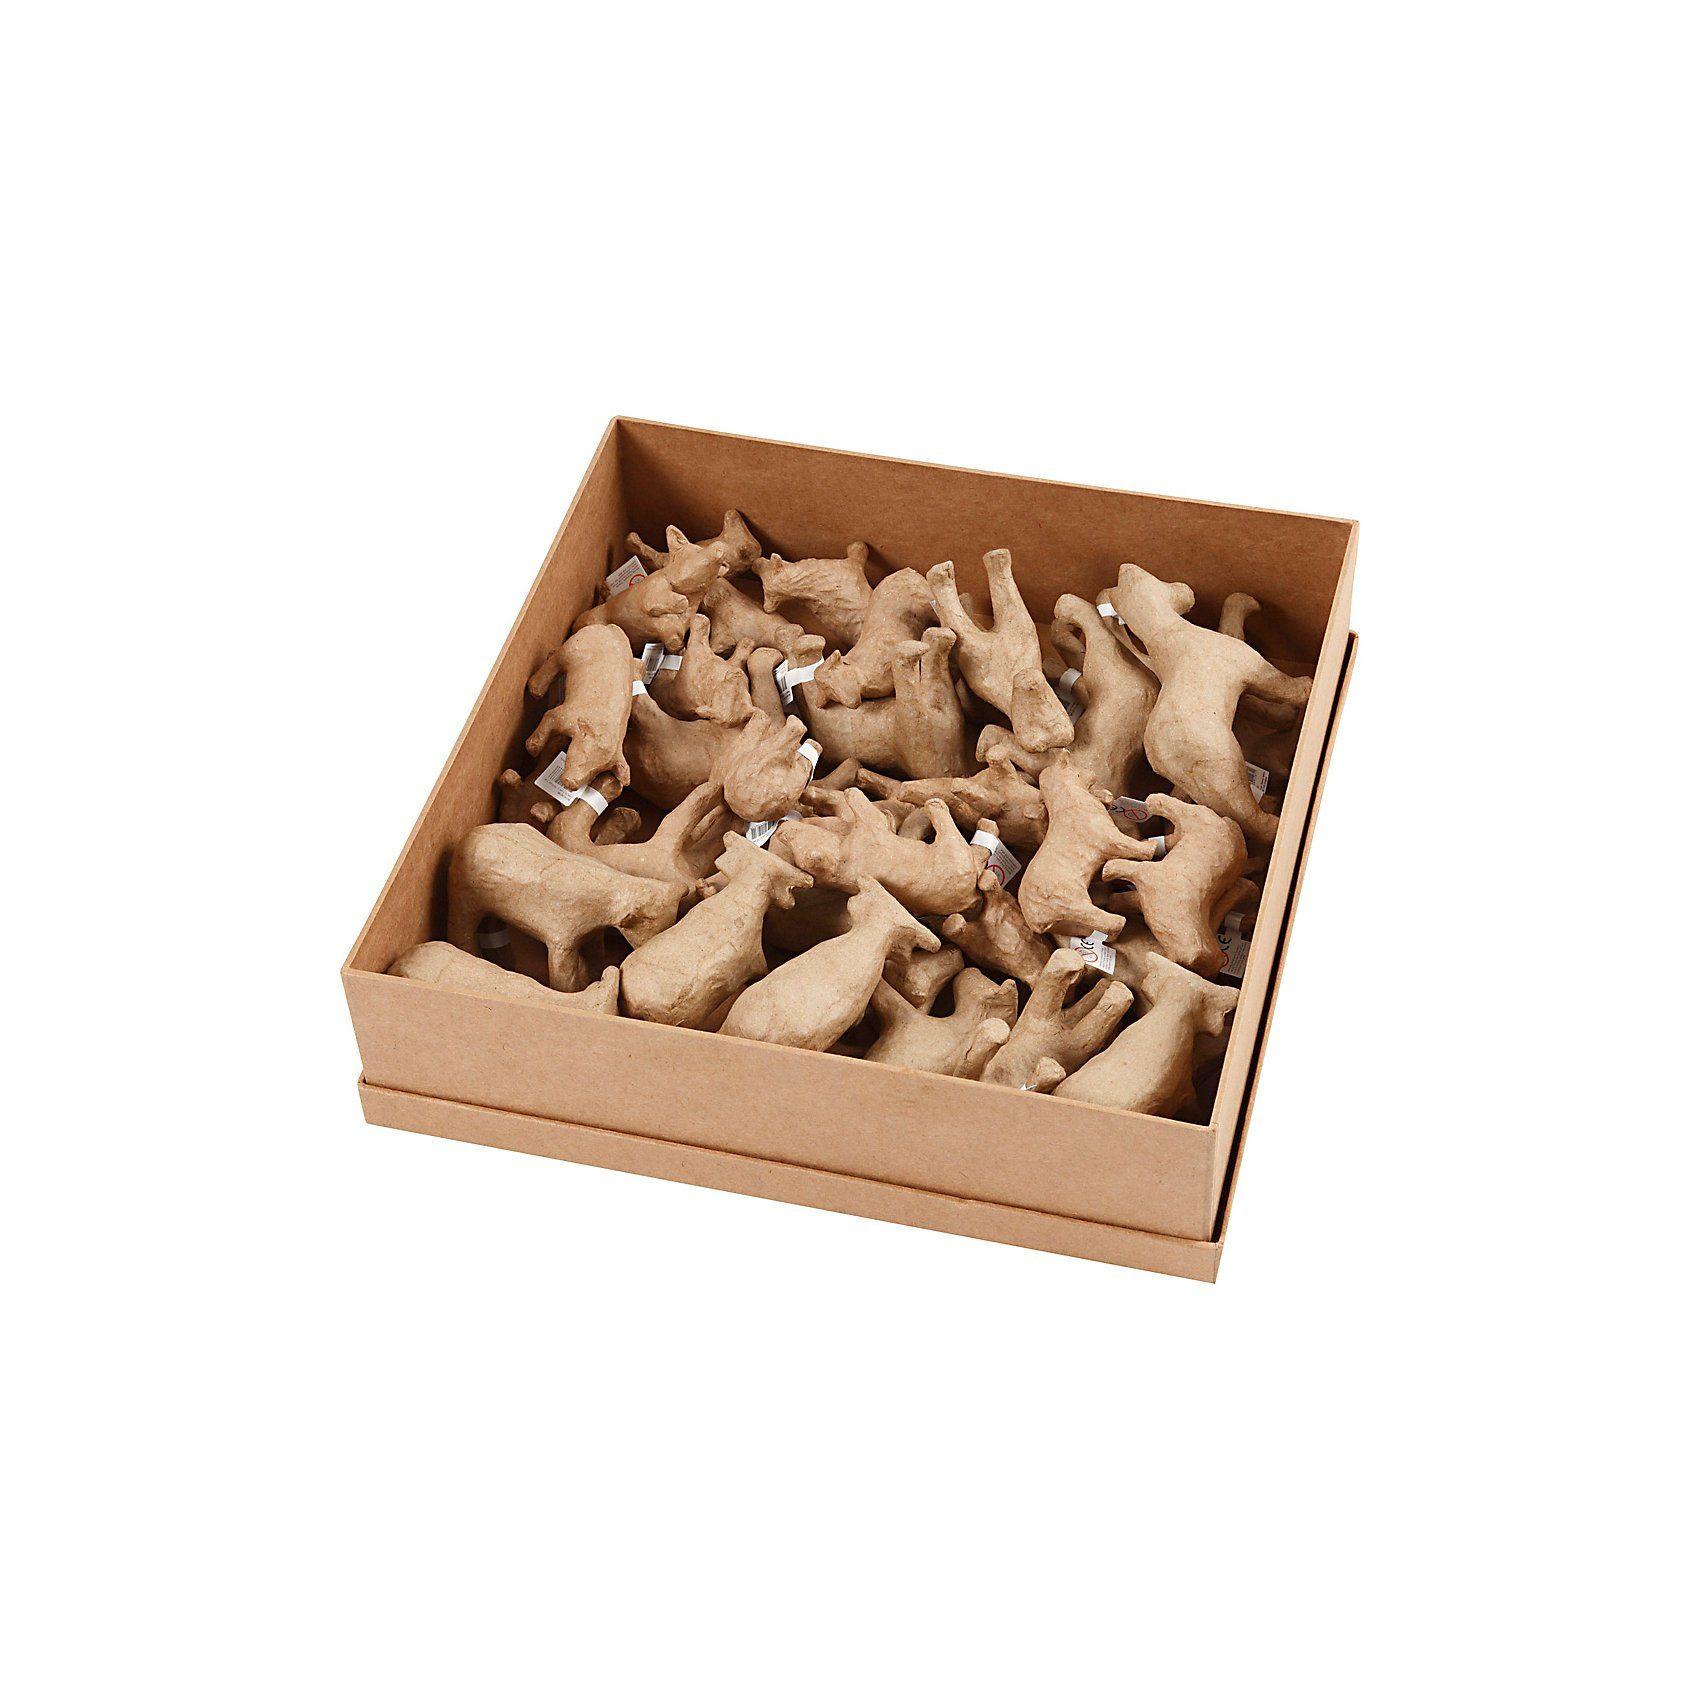 Pappmaché Bauernhof-Tiere, H 5-10,5 cm, L 9-12 cm, 32 Stück